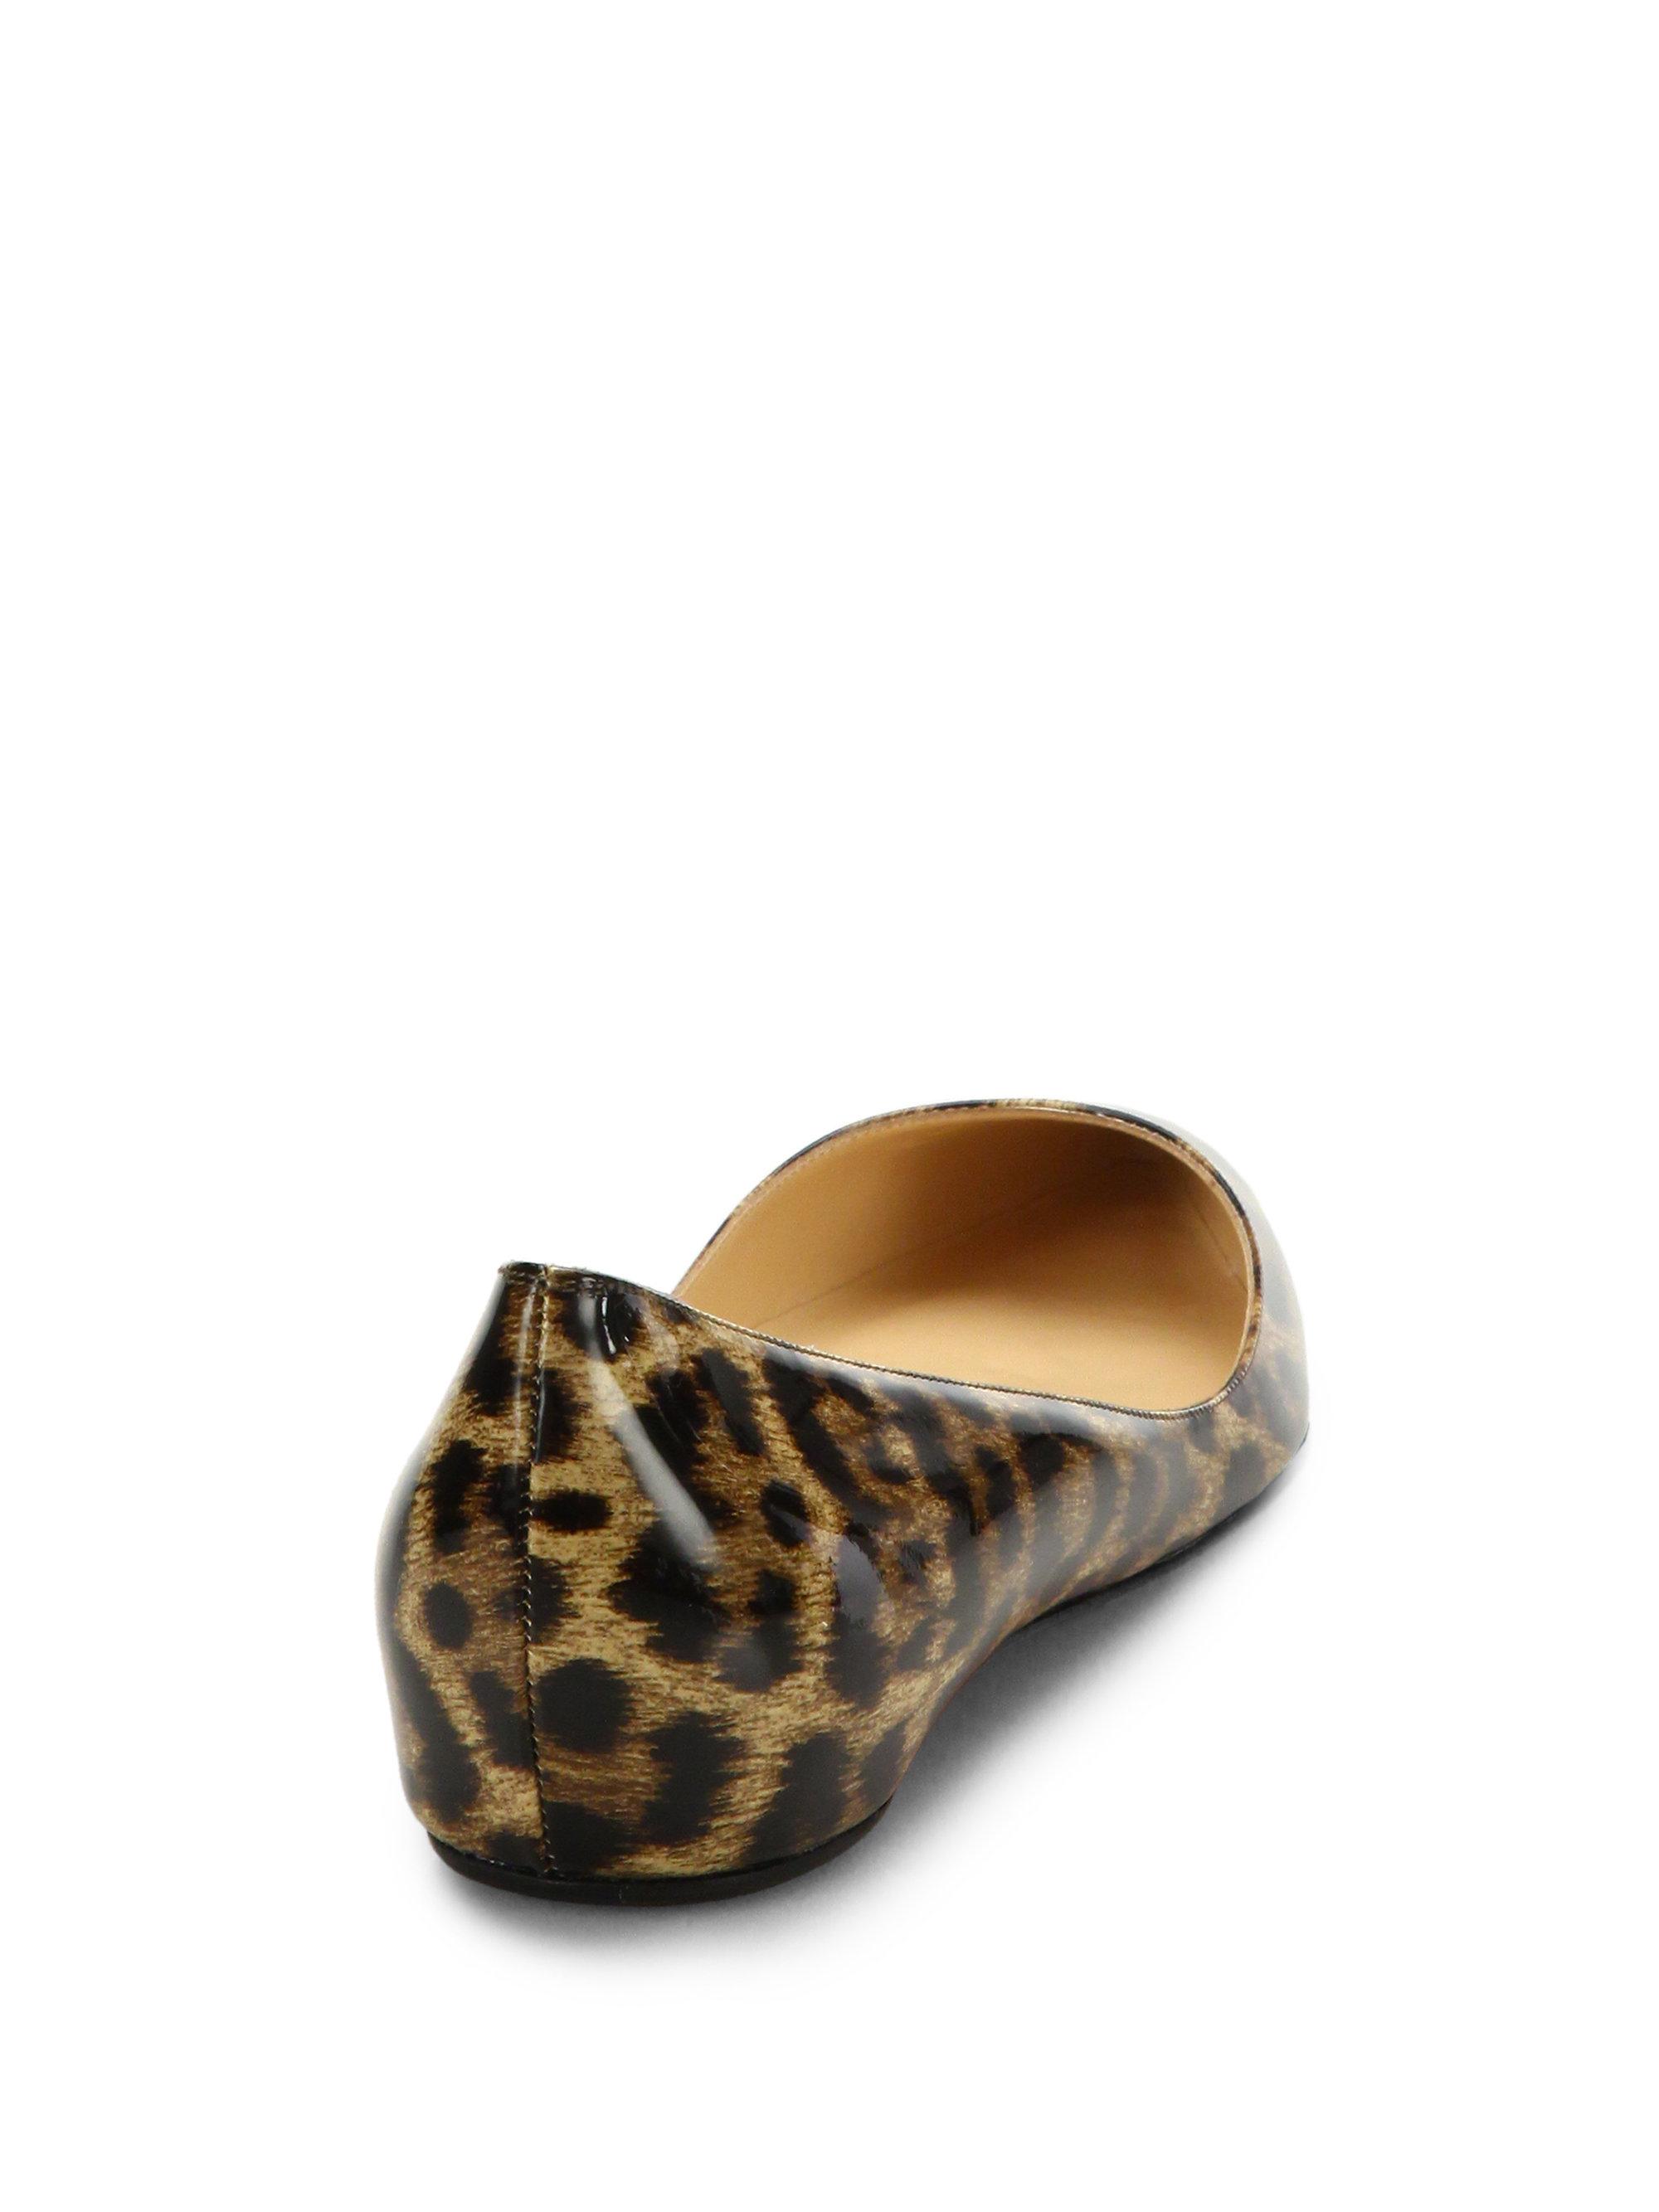 More Details Aquazzura Stylist Leopard-Print Ballet Flats Details Aquazzura ballet flats in leopard-printed dyed calf hair (New Zealand).